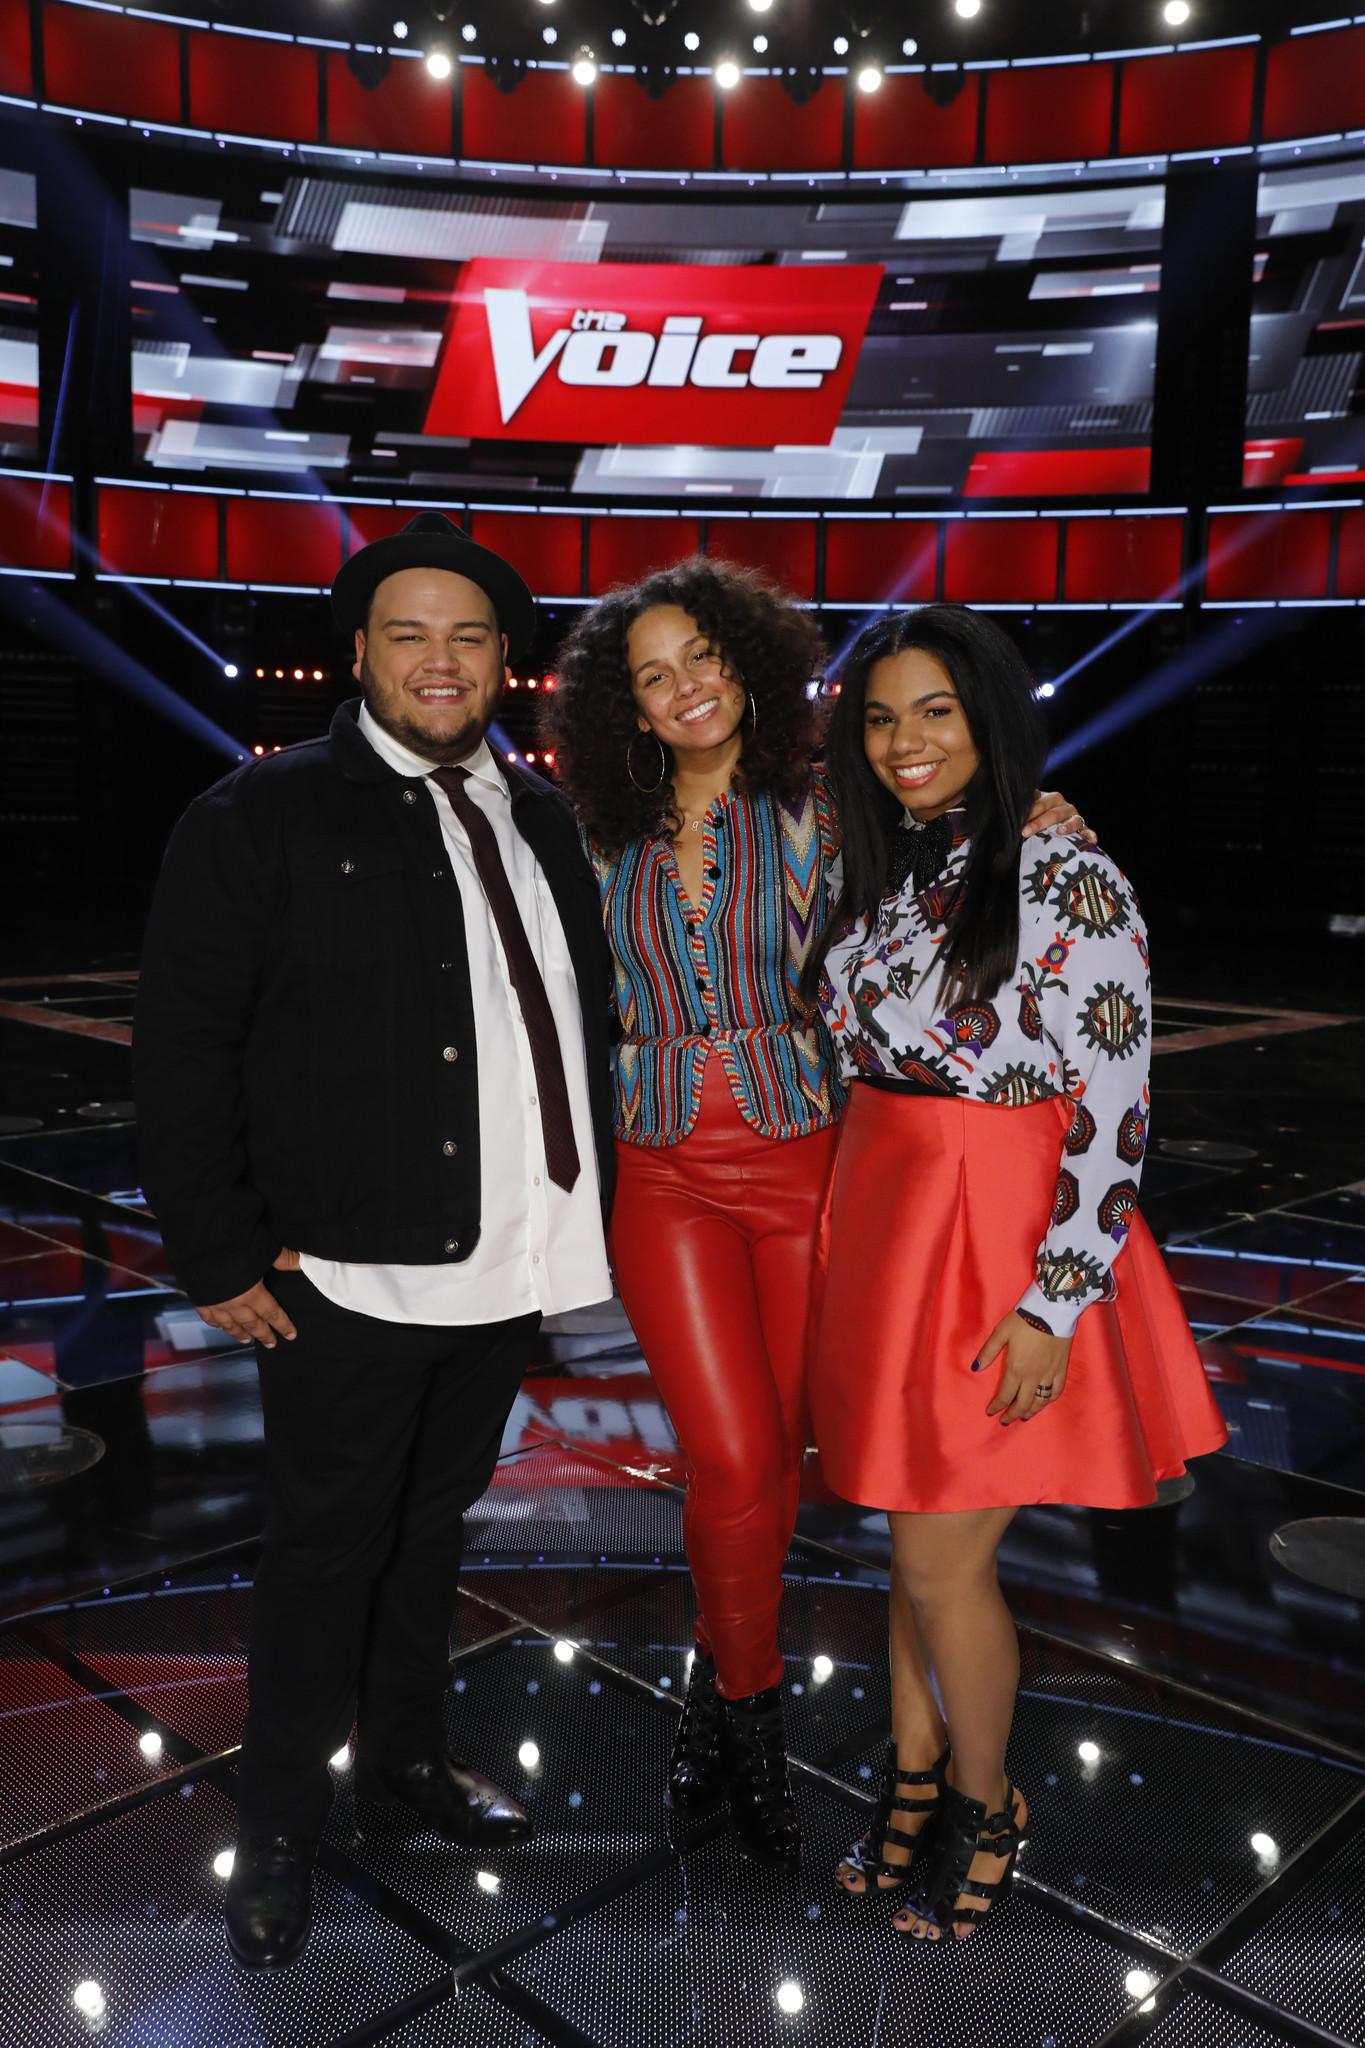 Orlando singer 'voice of generation,' Alicia Keys says